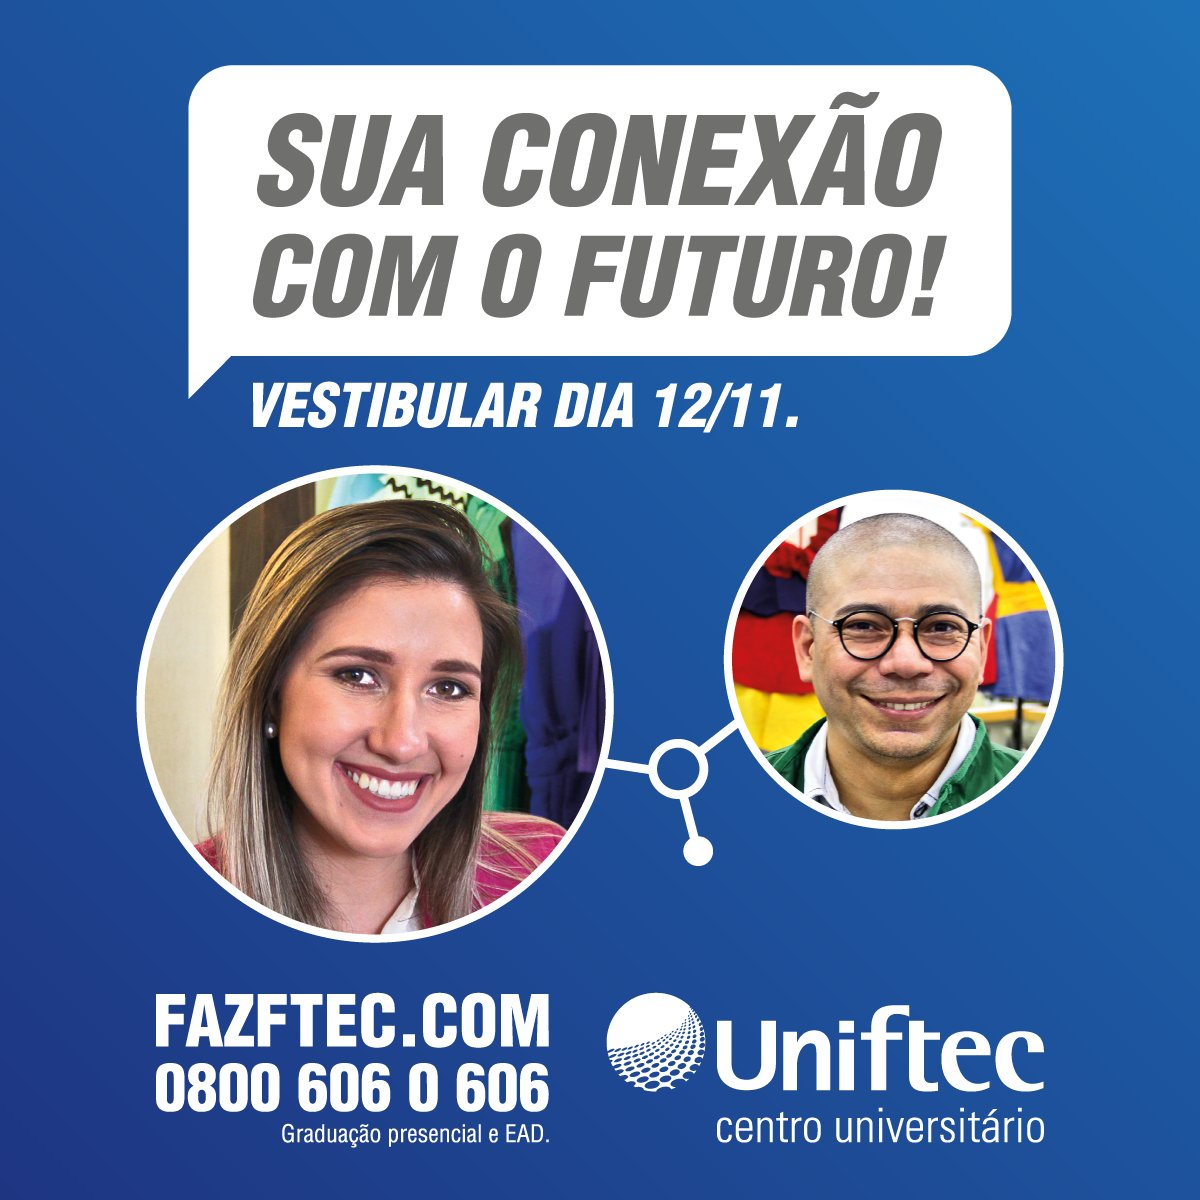 Acesse e confira aos novos cursos oferecidos! https://t.co/DatbILk9VN #VestibulardeVerão #vestibular2017 #Uniftec #FtecFaculdades #FazFtec https://t.co/yEY3dBC96C